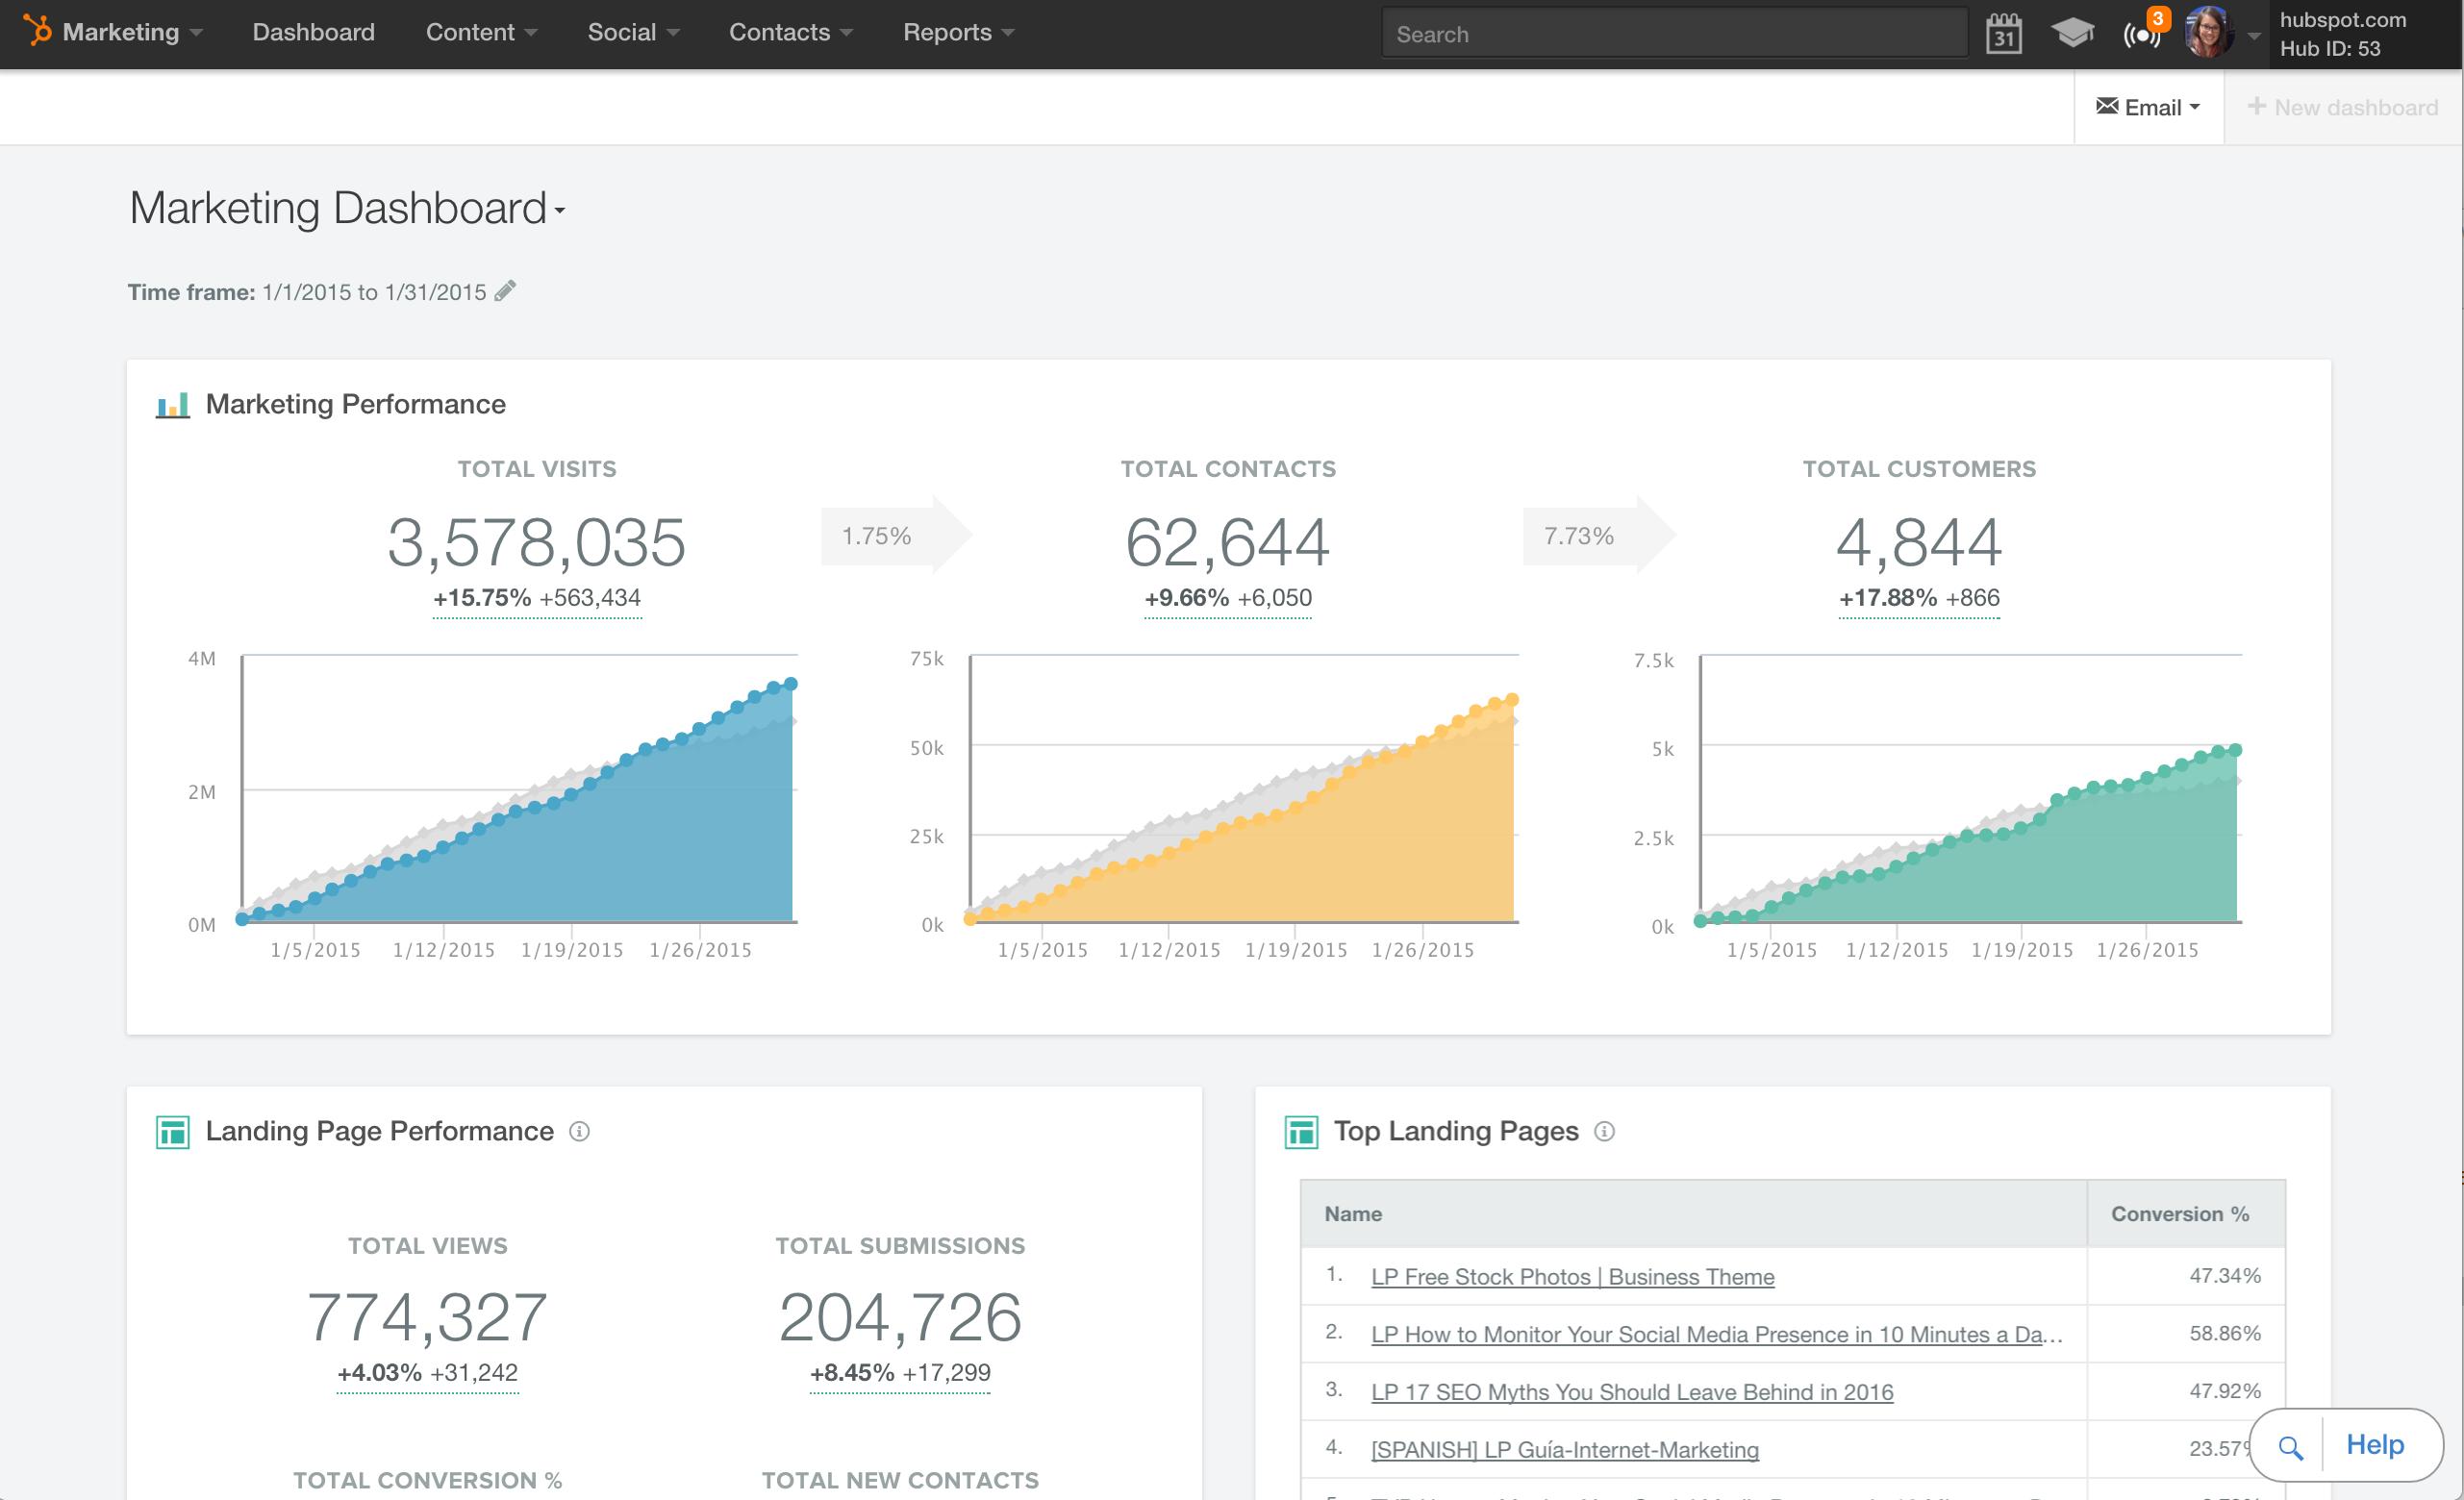 Dashboard in Hubspot Marketing Hub